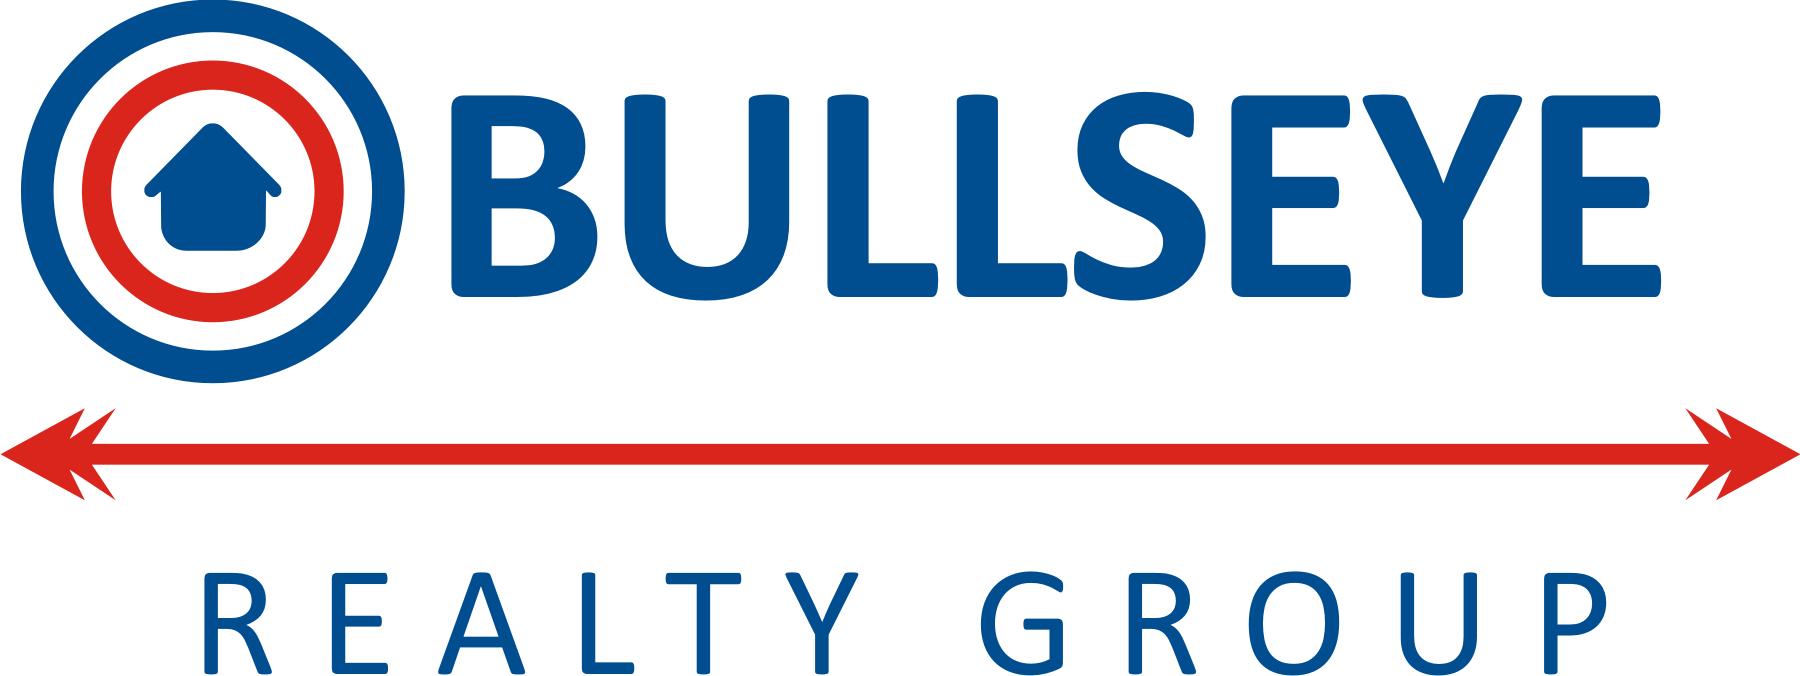 Bullseye Realty Group